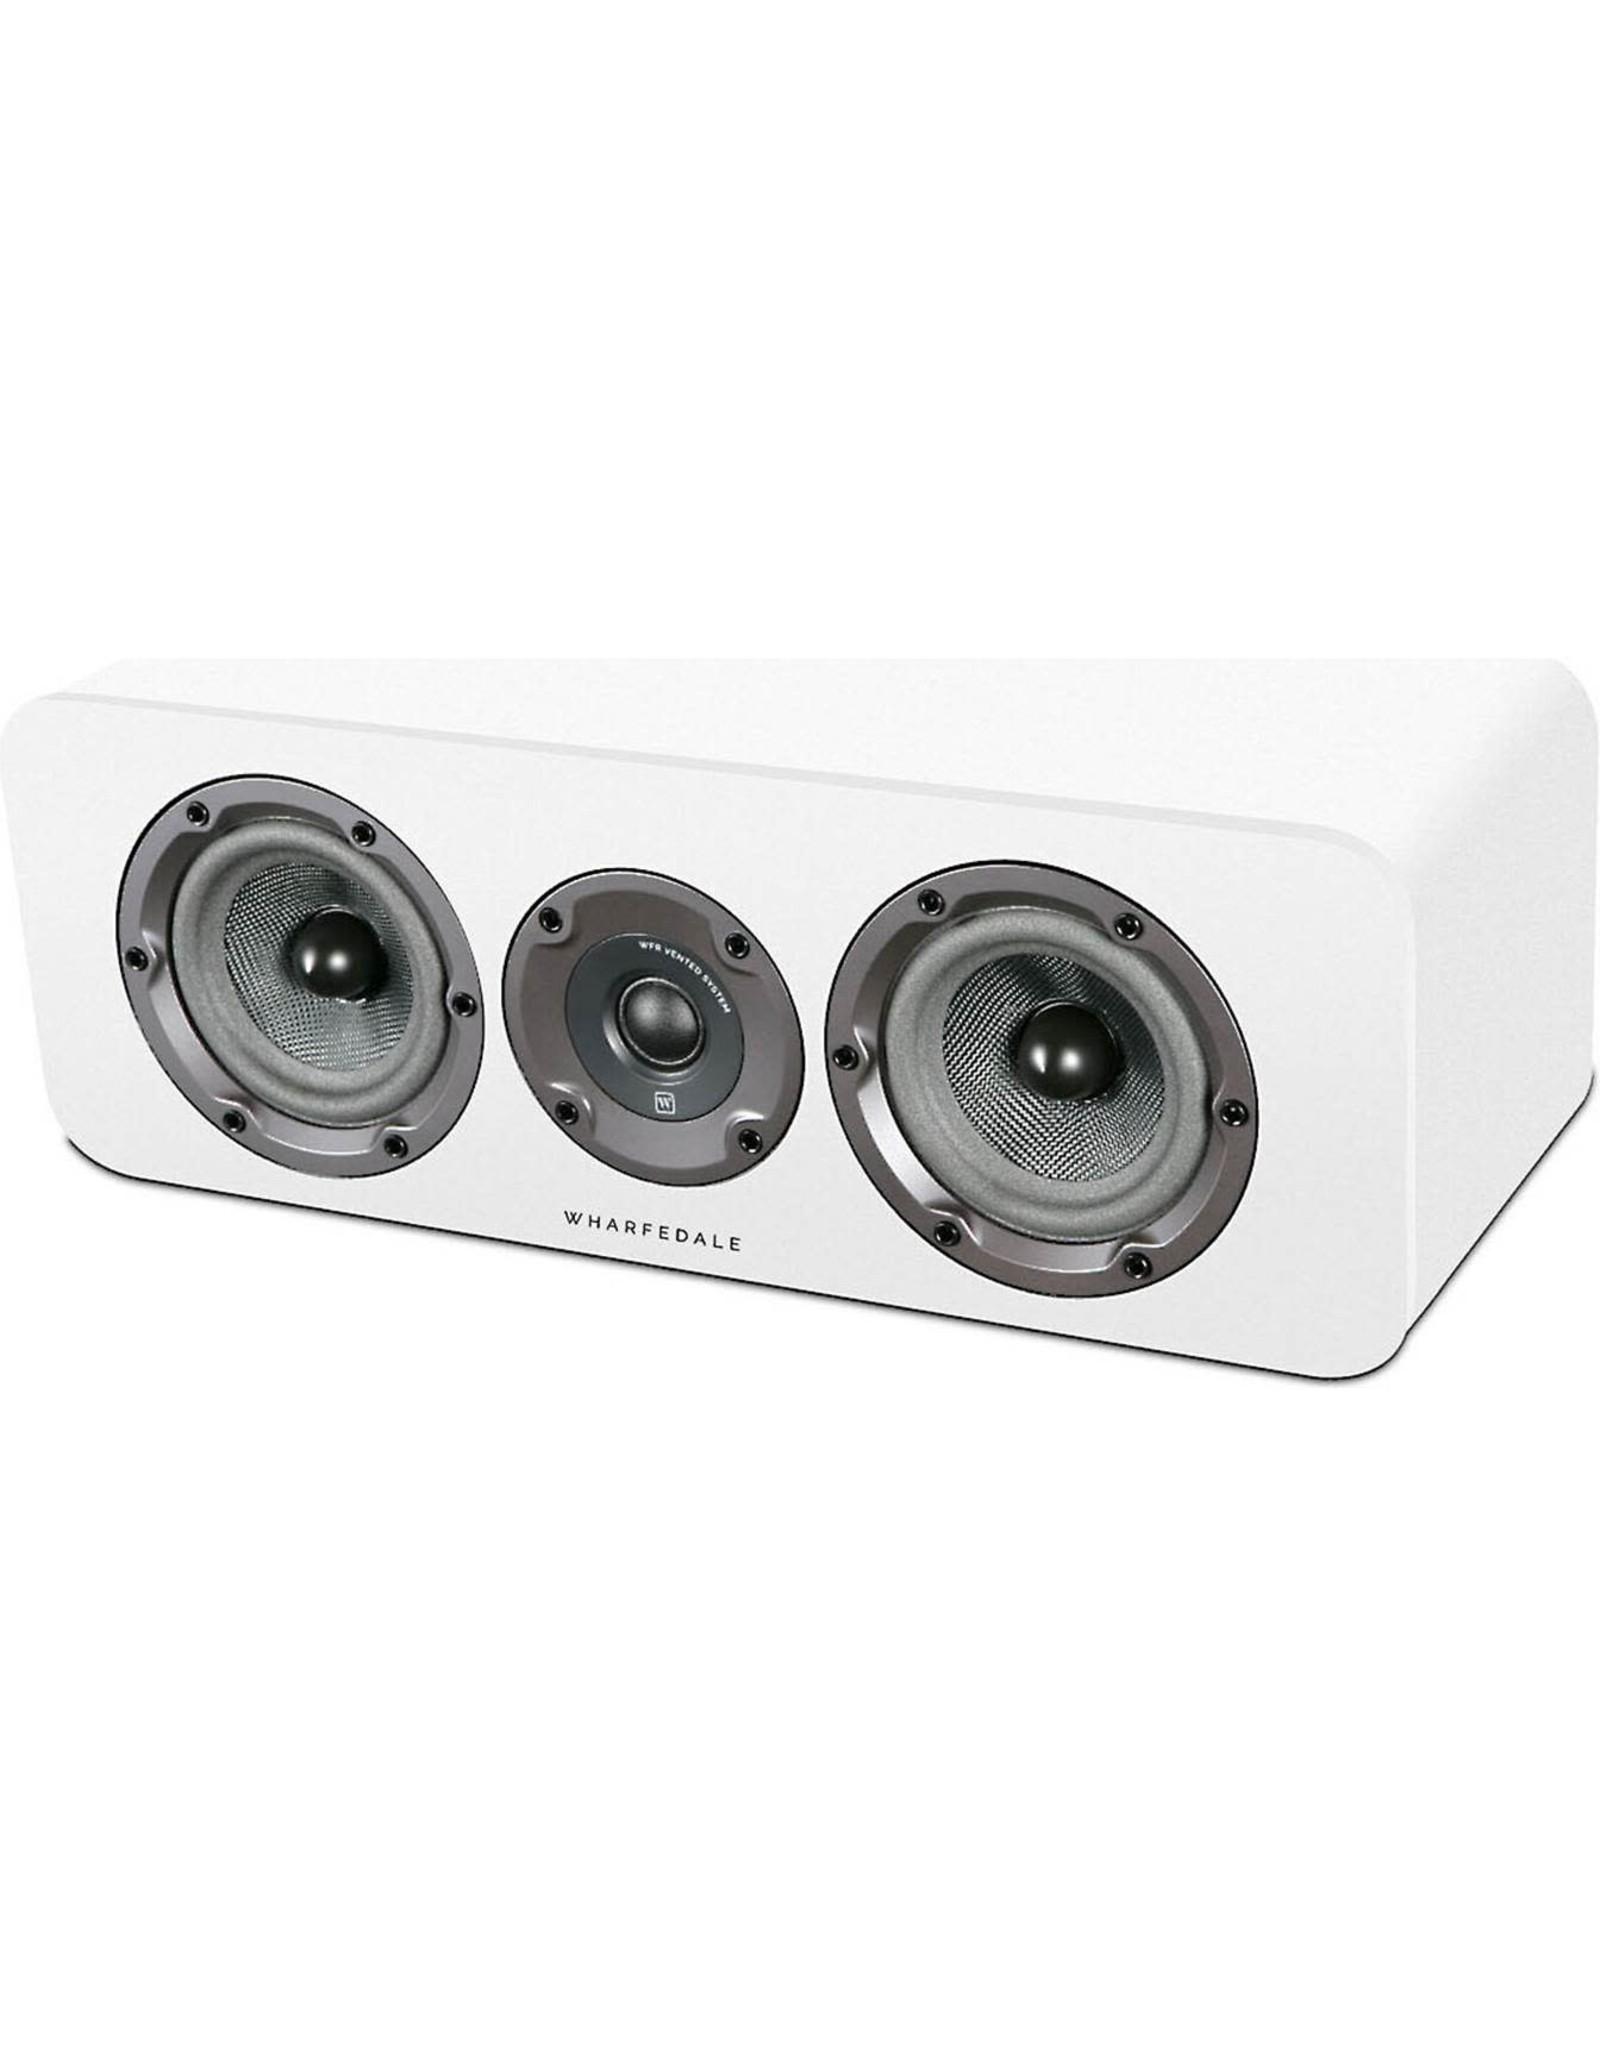 Wharfedale Wharfedale D300C Center Speaker